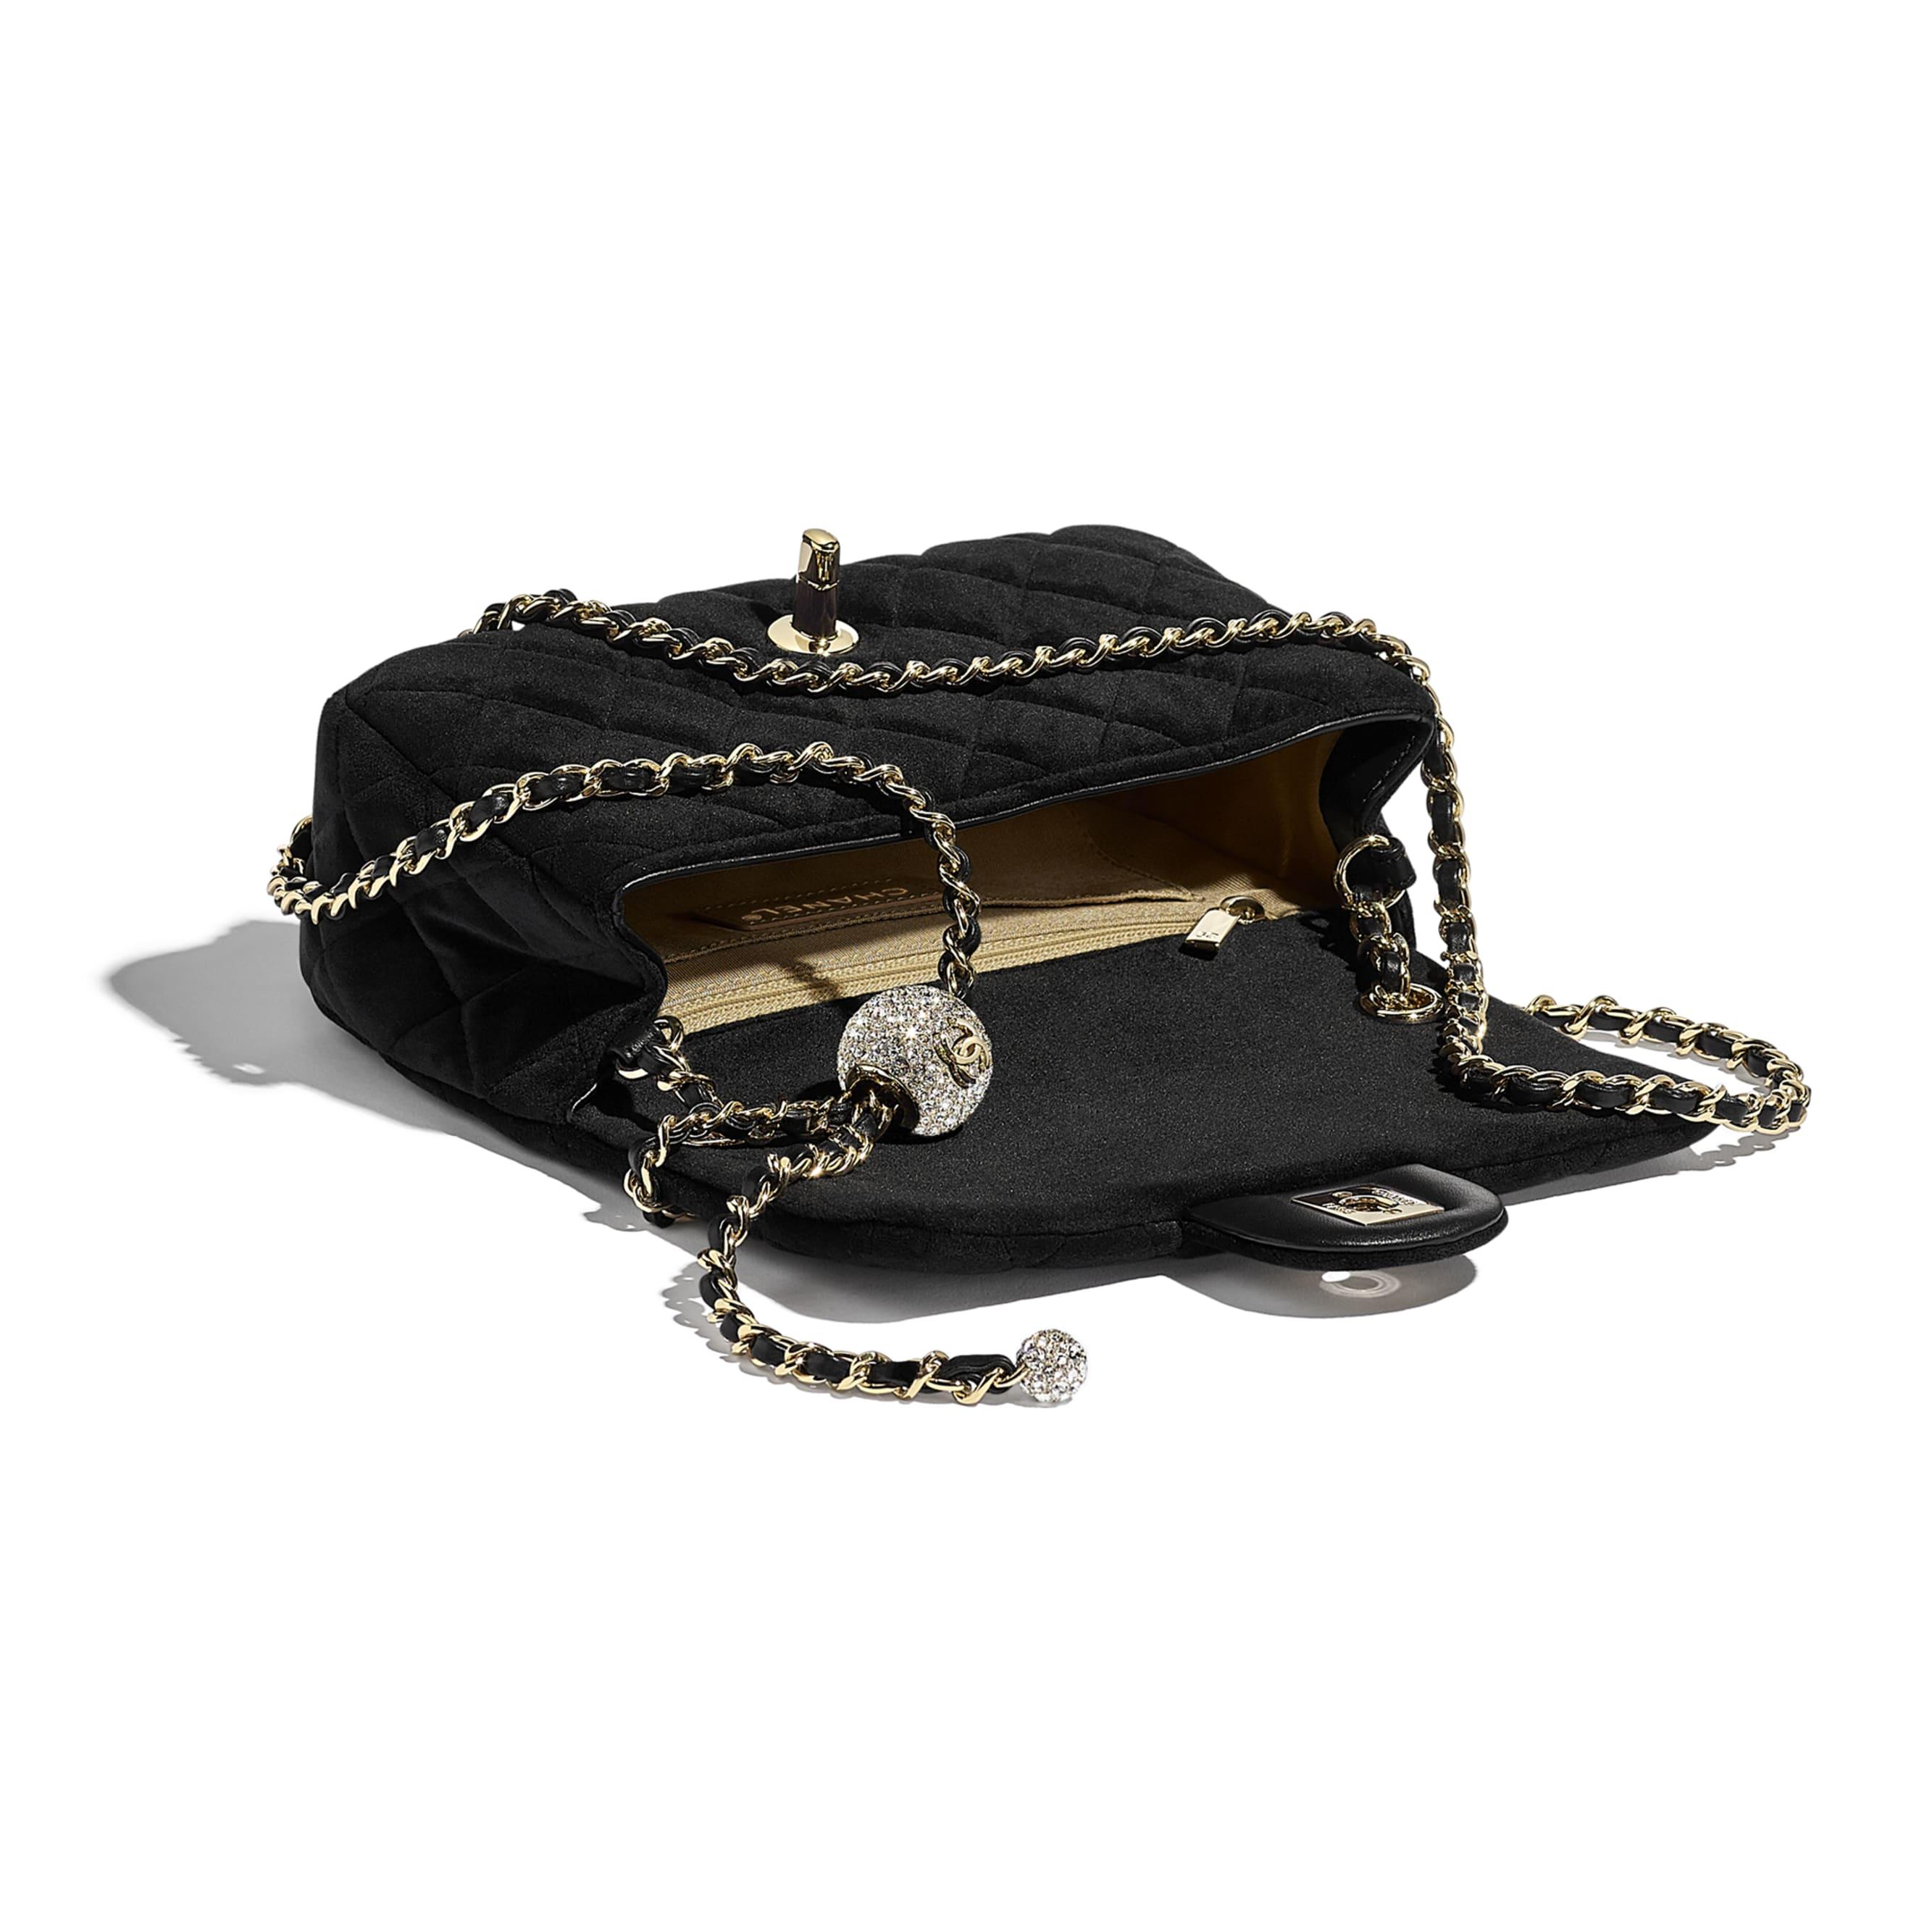 Flap Bag - Black - Velvet, Diamanté & Silver-Tone Metal - CHANEL - Other view - see standard sized version